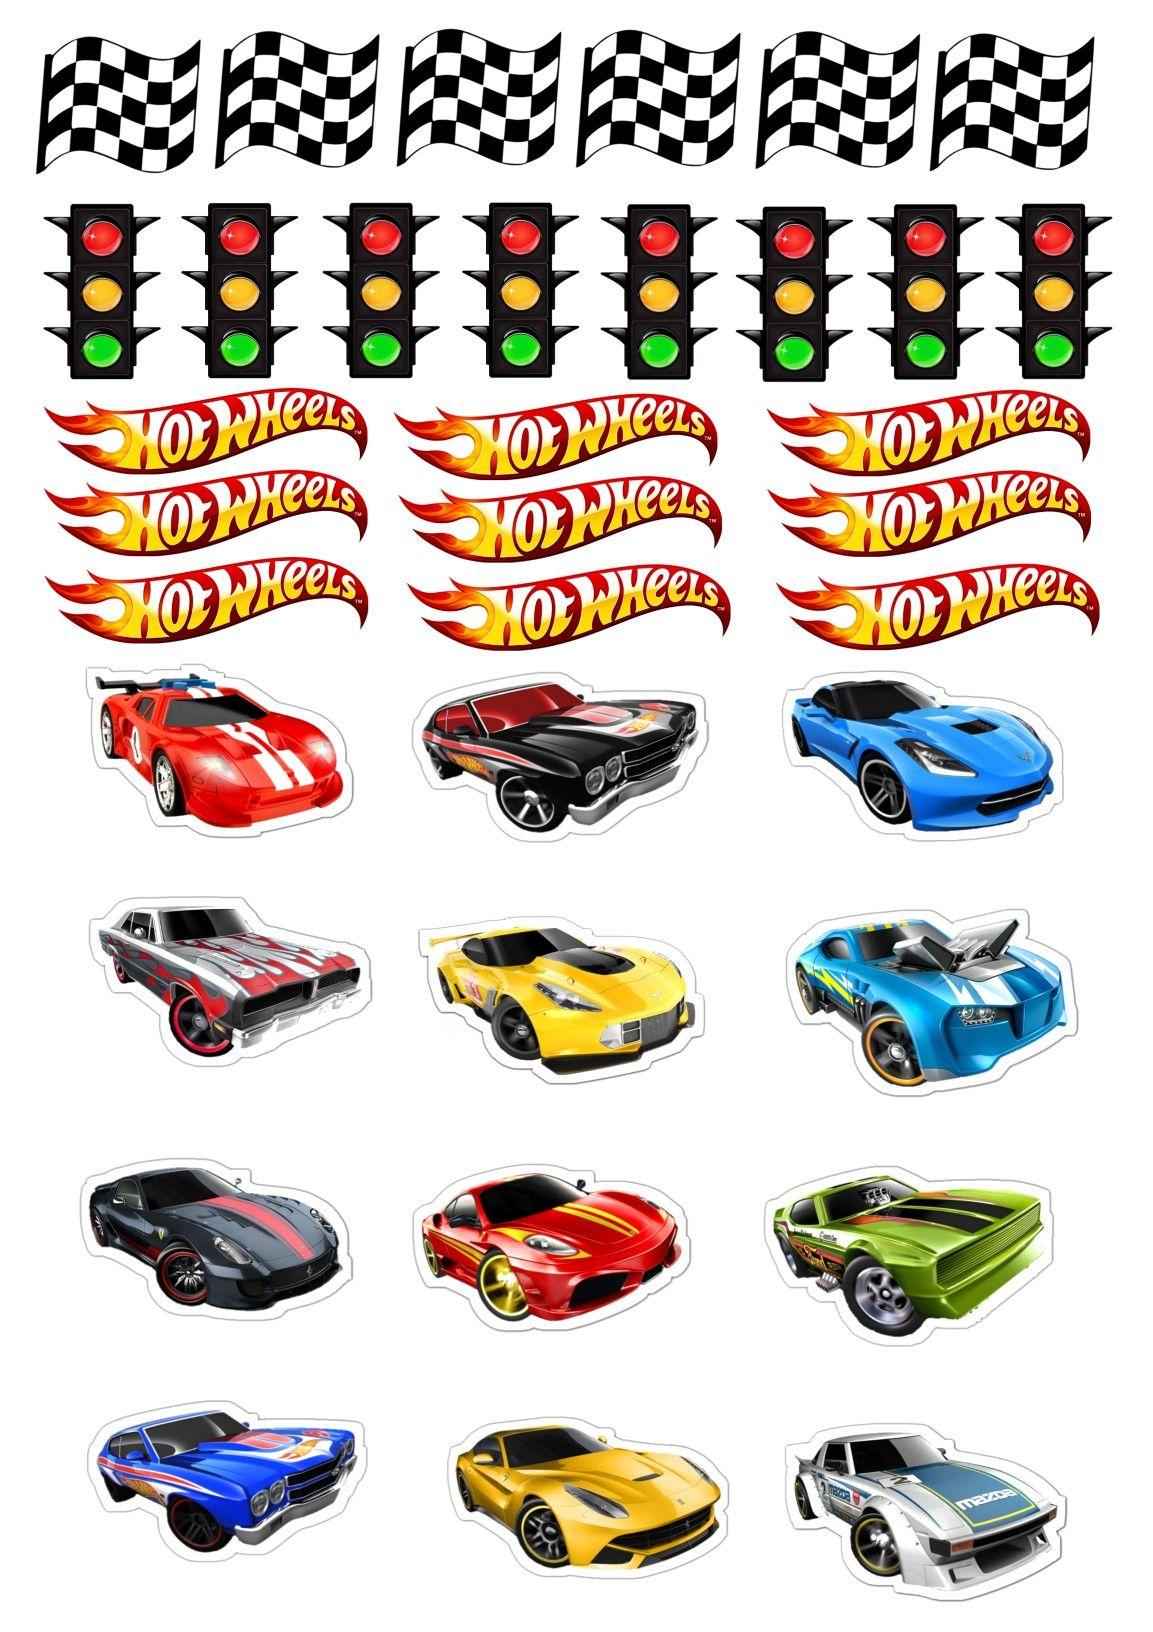 Topper Hot Wheels Aniversario Hot Wheels Festa Hot Wheels Hot Wheels